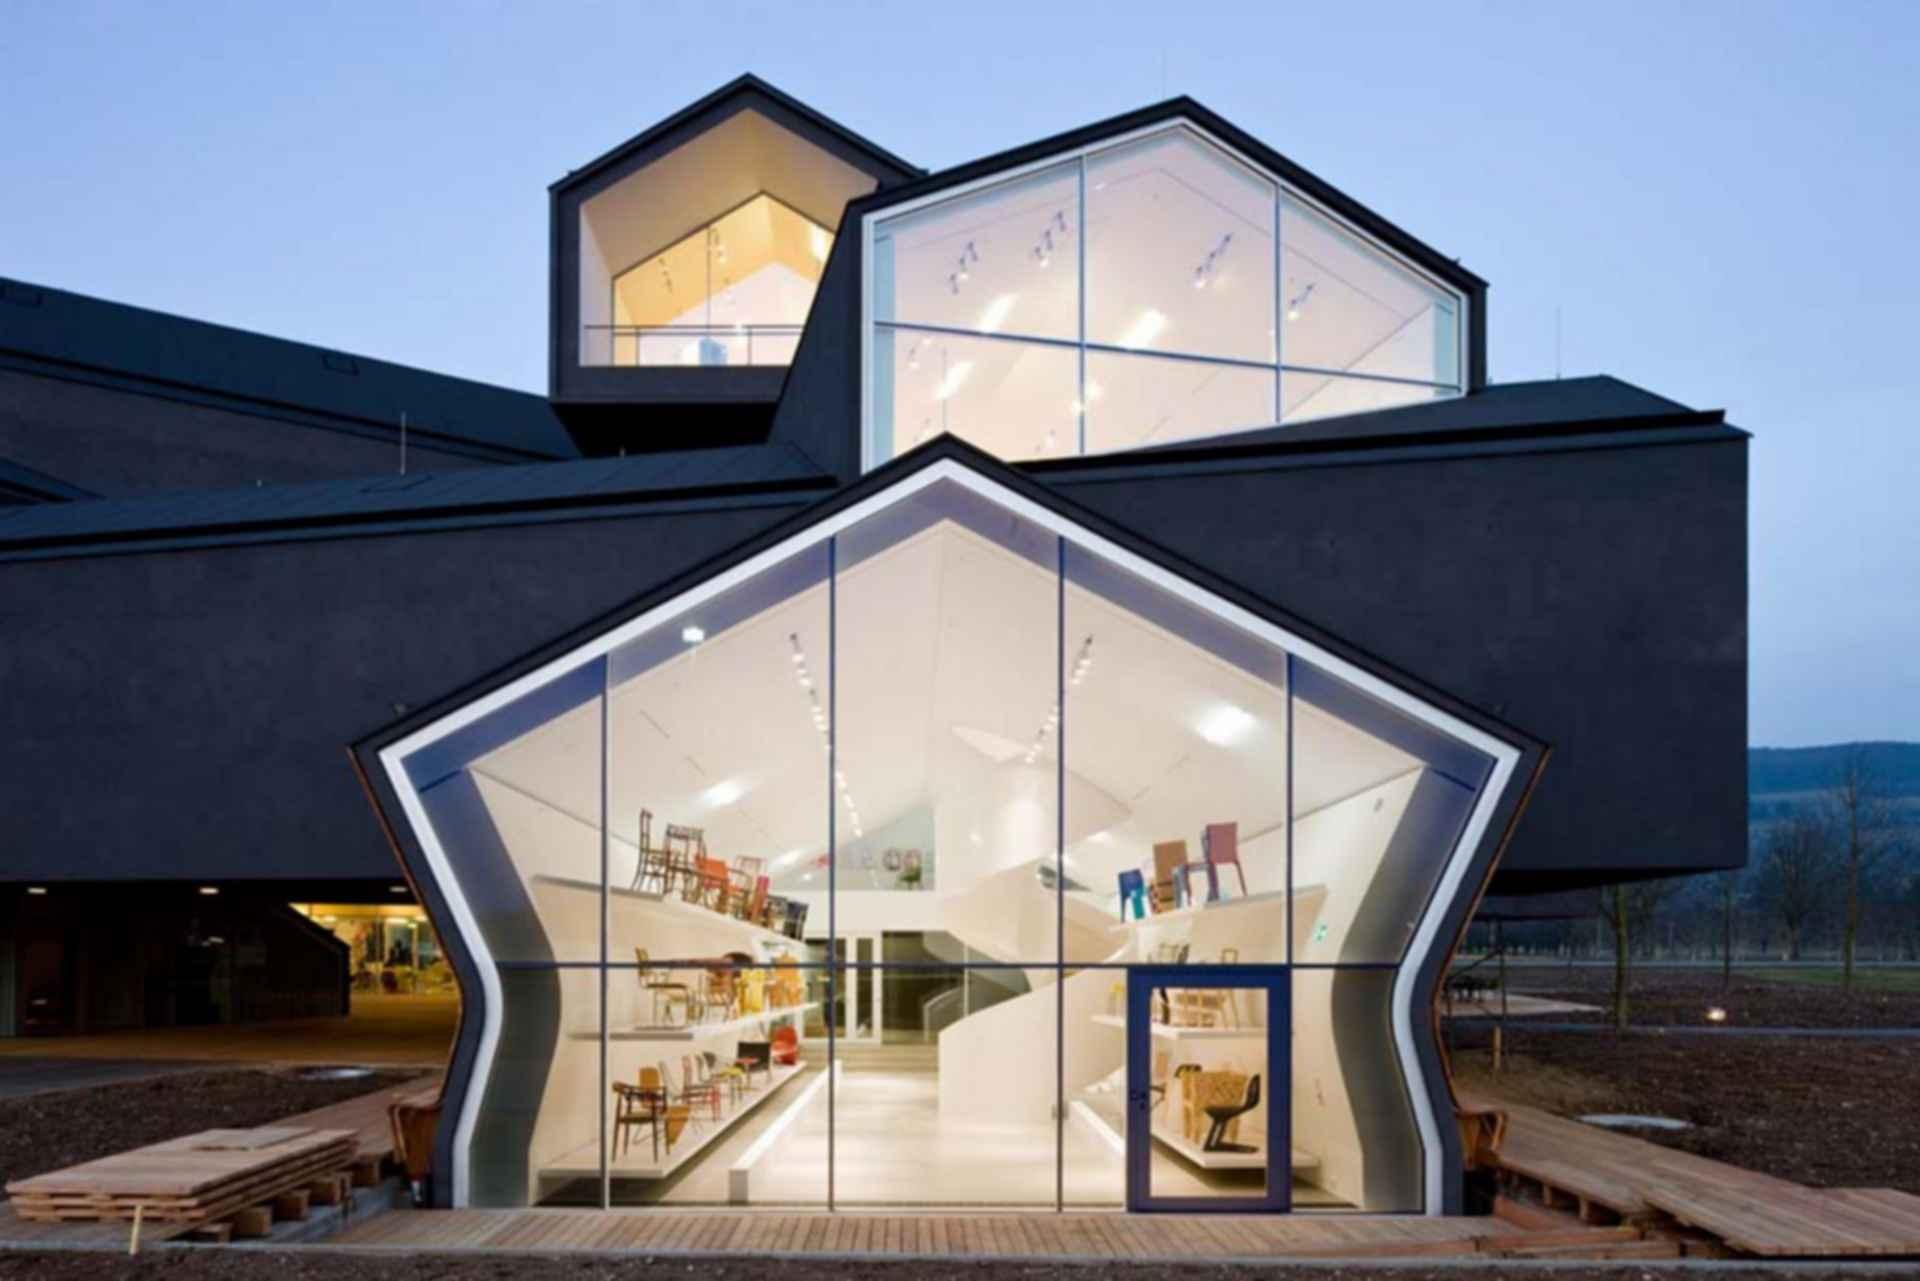 Vitra House - exterior windows